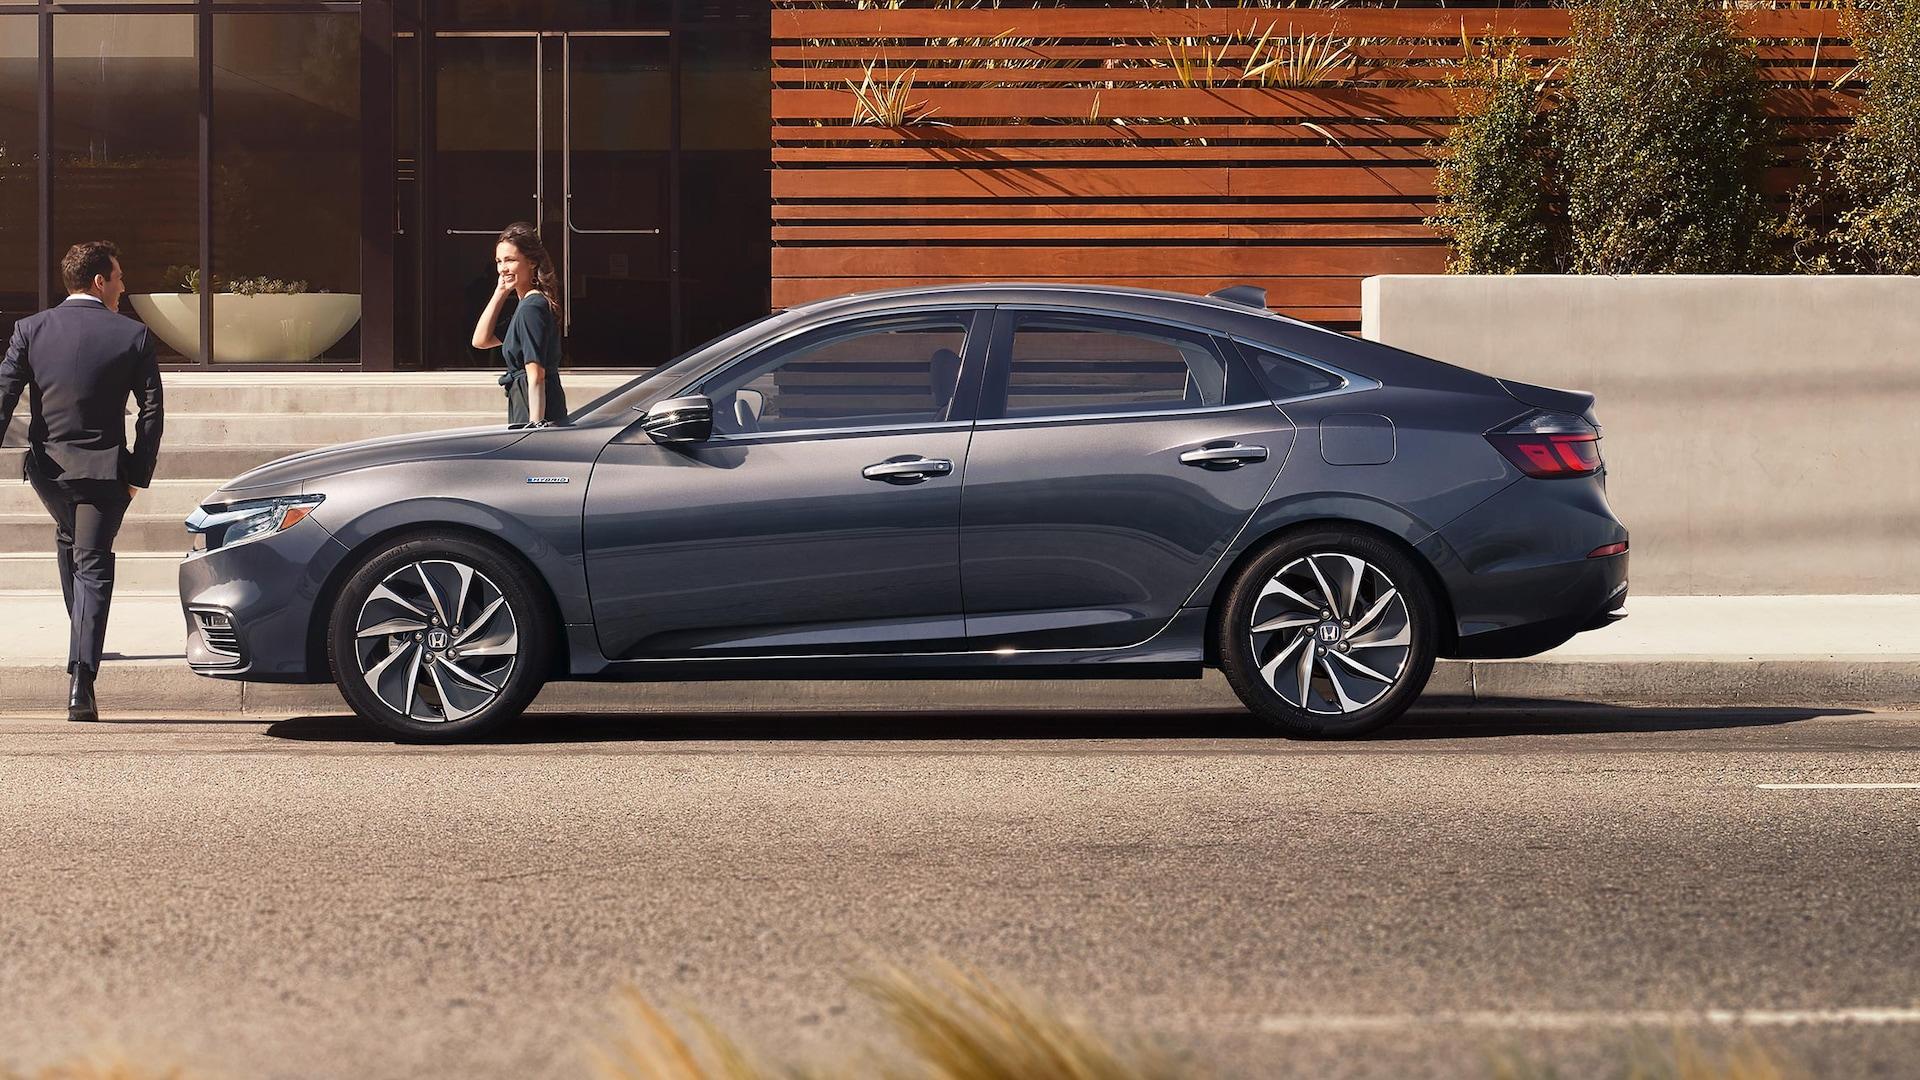 Vista de perfil del lado del conductor del Honda Insight Touring2020 en Modern Steel Metallic estacionado frente a una casa moderna.